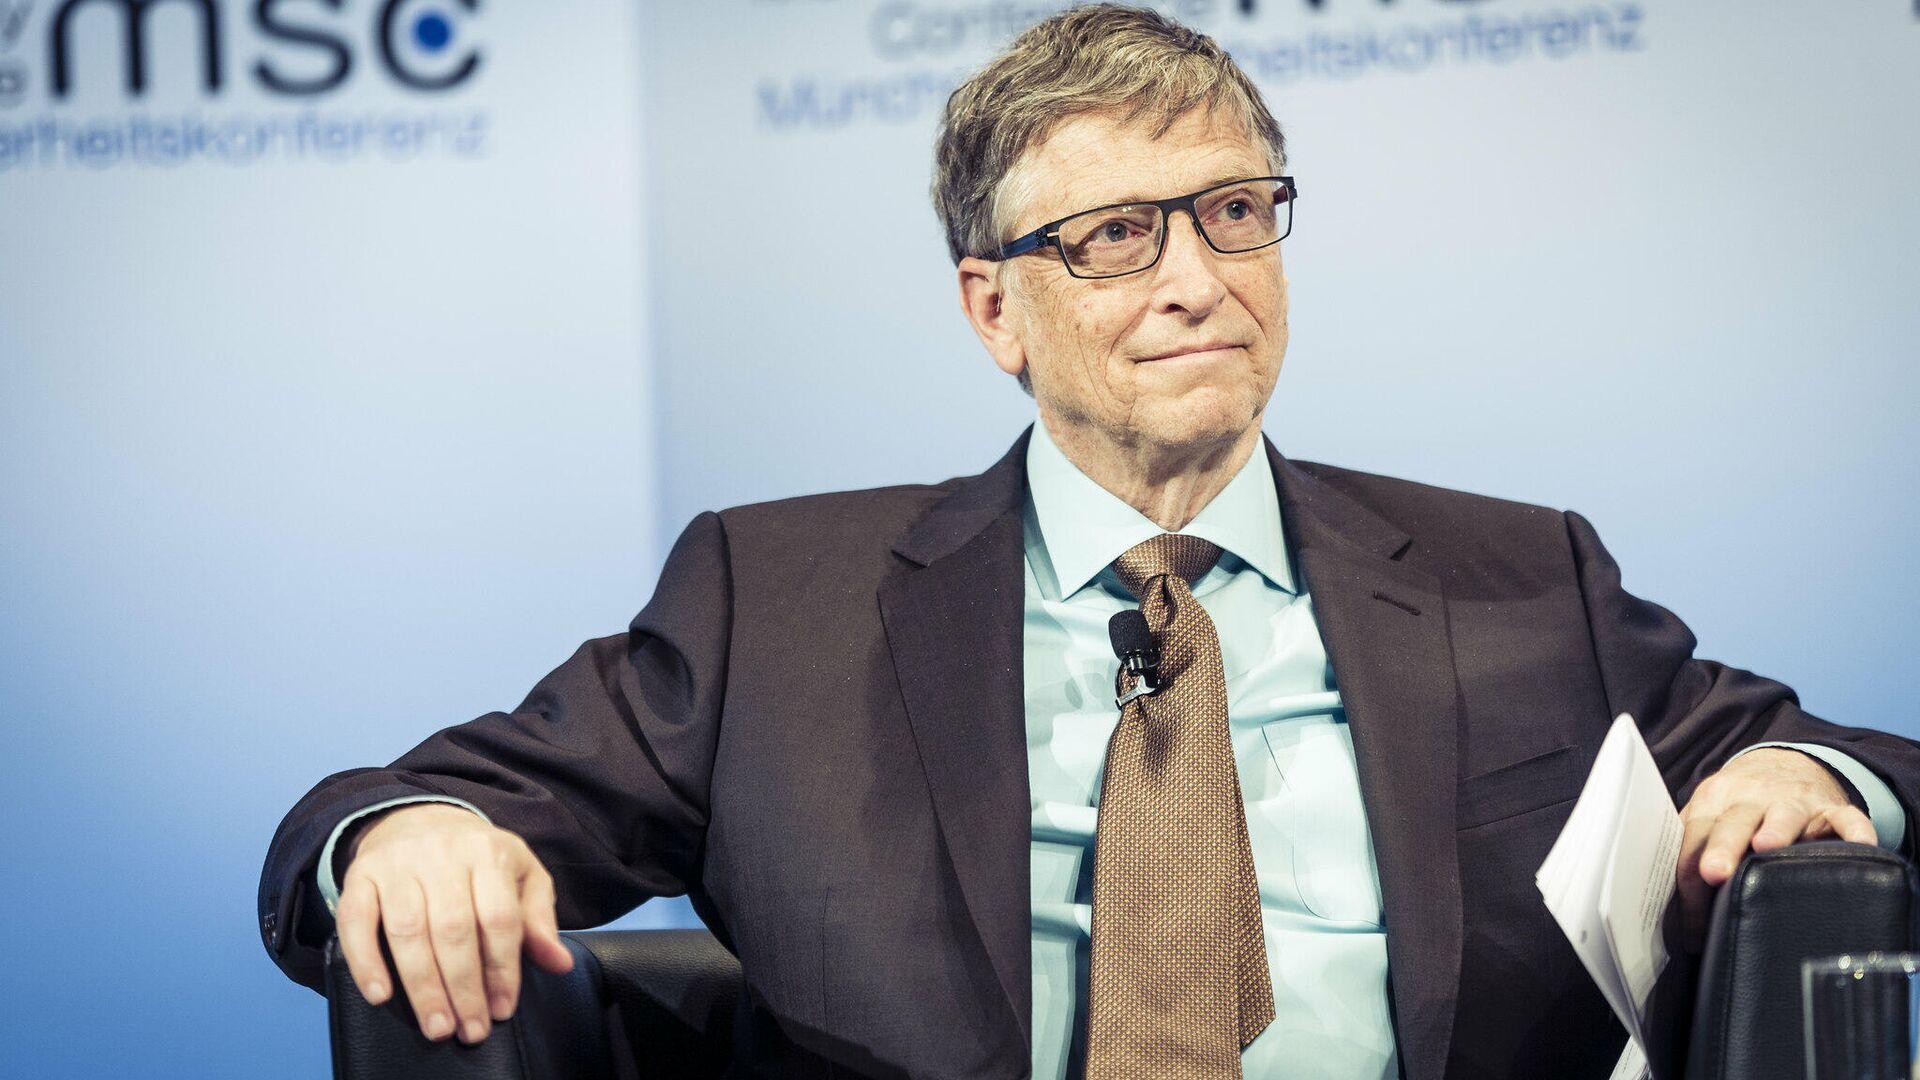 El fundador de Microsoft Bill Gates (archivo) - Sputnik Mundo, 1920, 26.02.2021